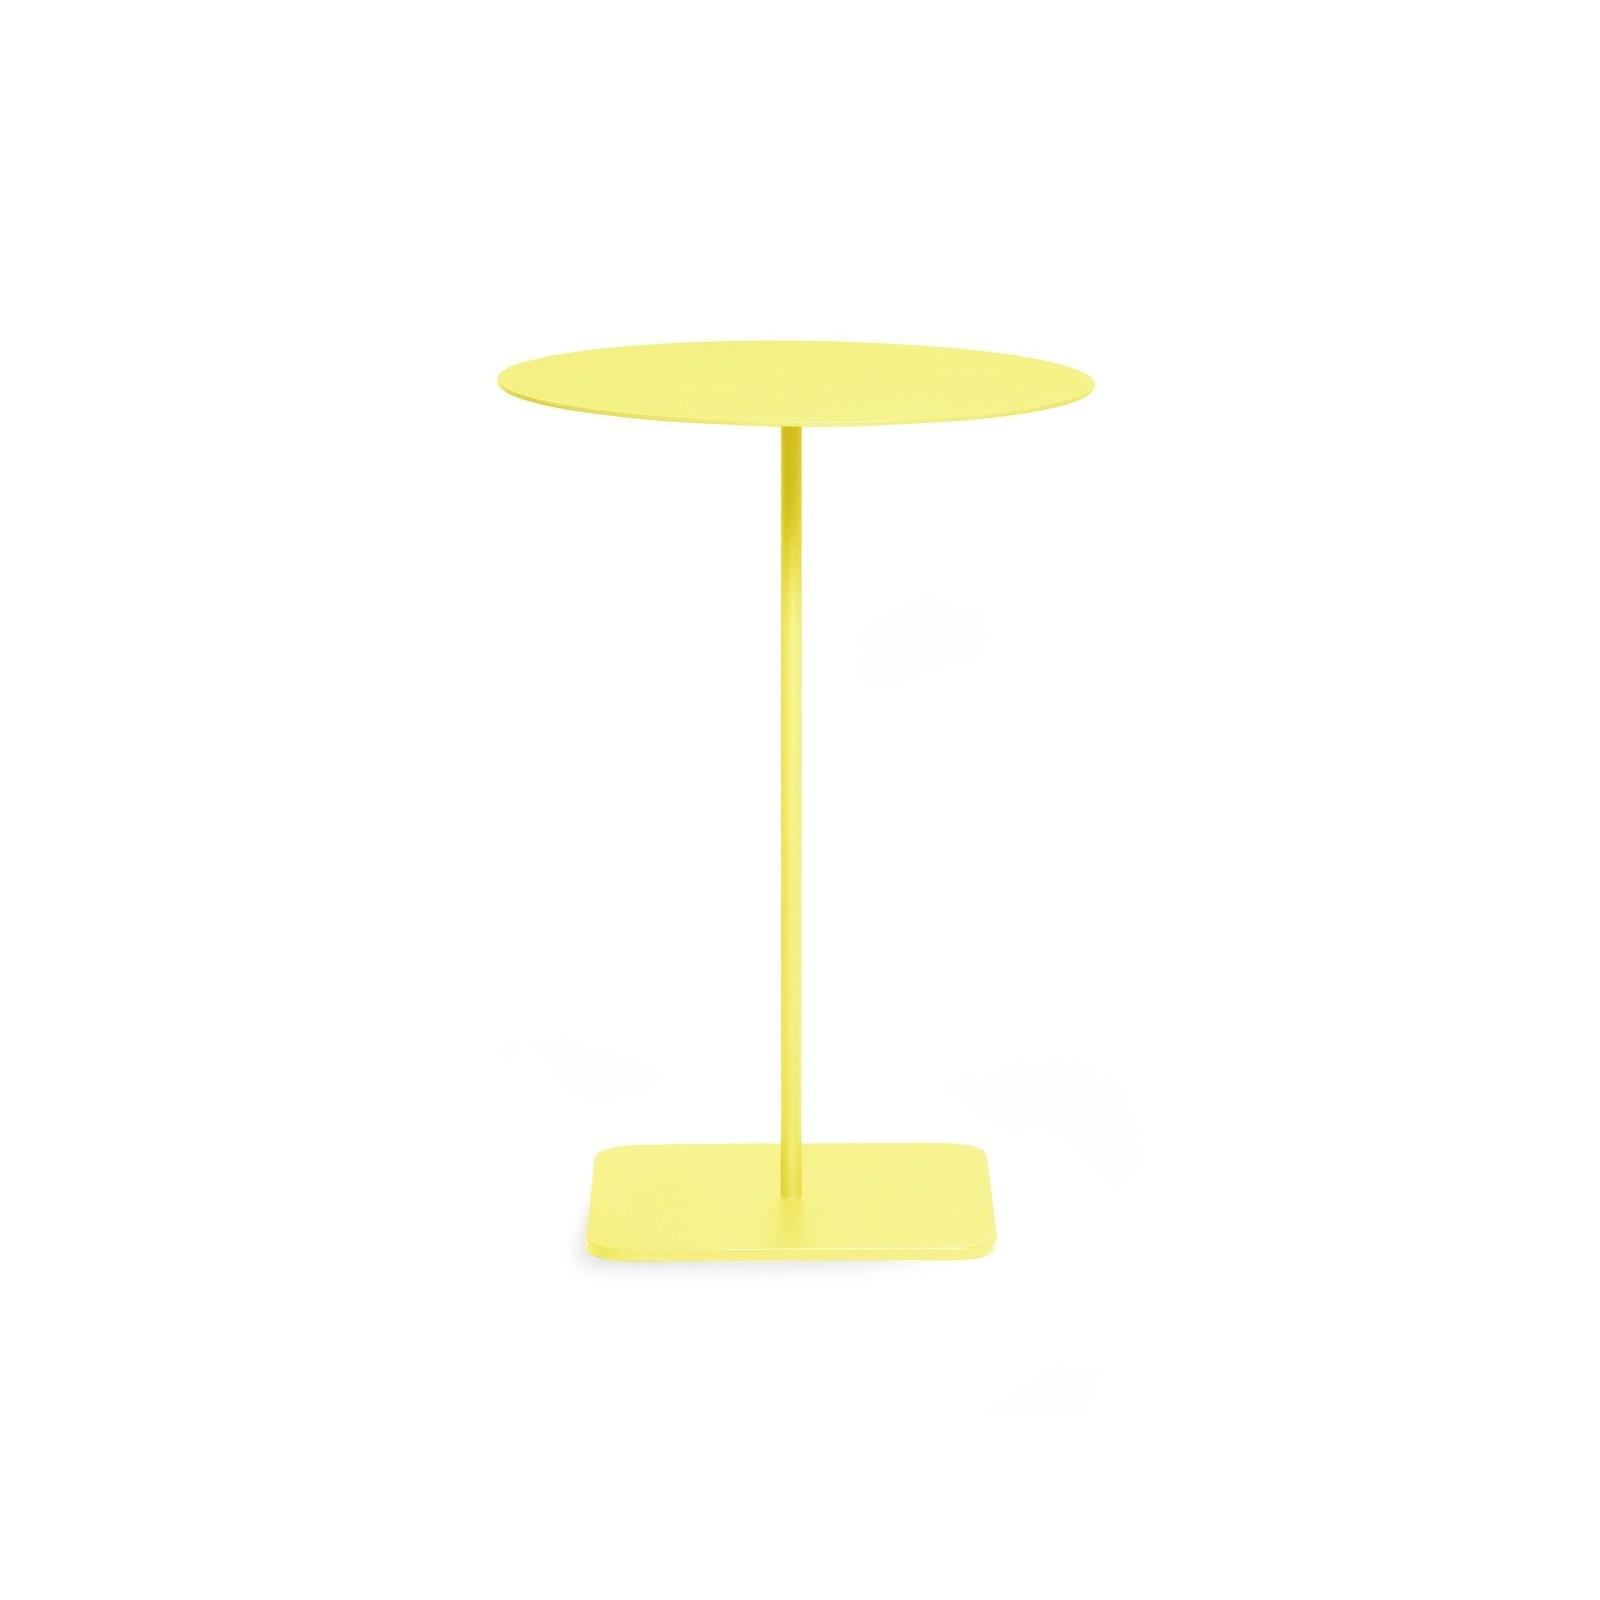 Mesita coffee table - 57 - yellow